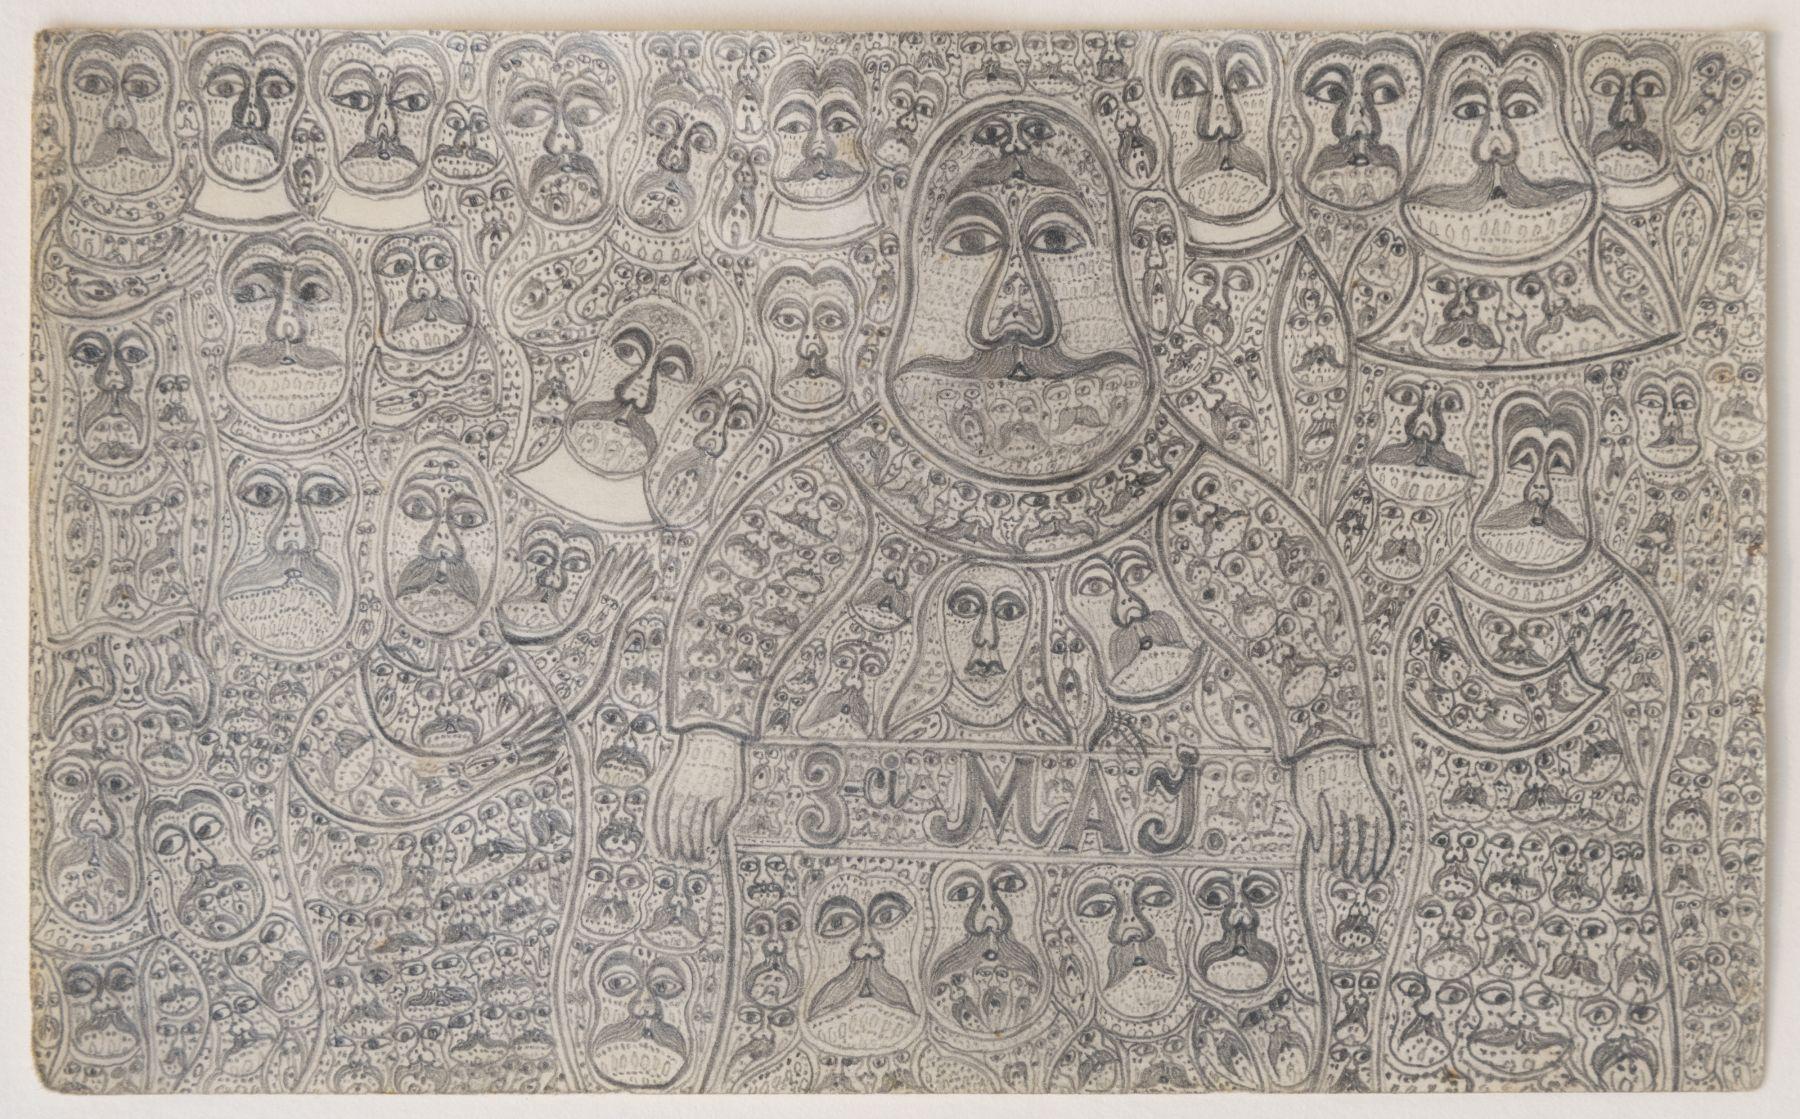 "Edmund Monsiel (1897-1962) ""3 maj"", źródło: własność prywatna (outsiderartfair.com)"